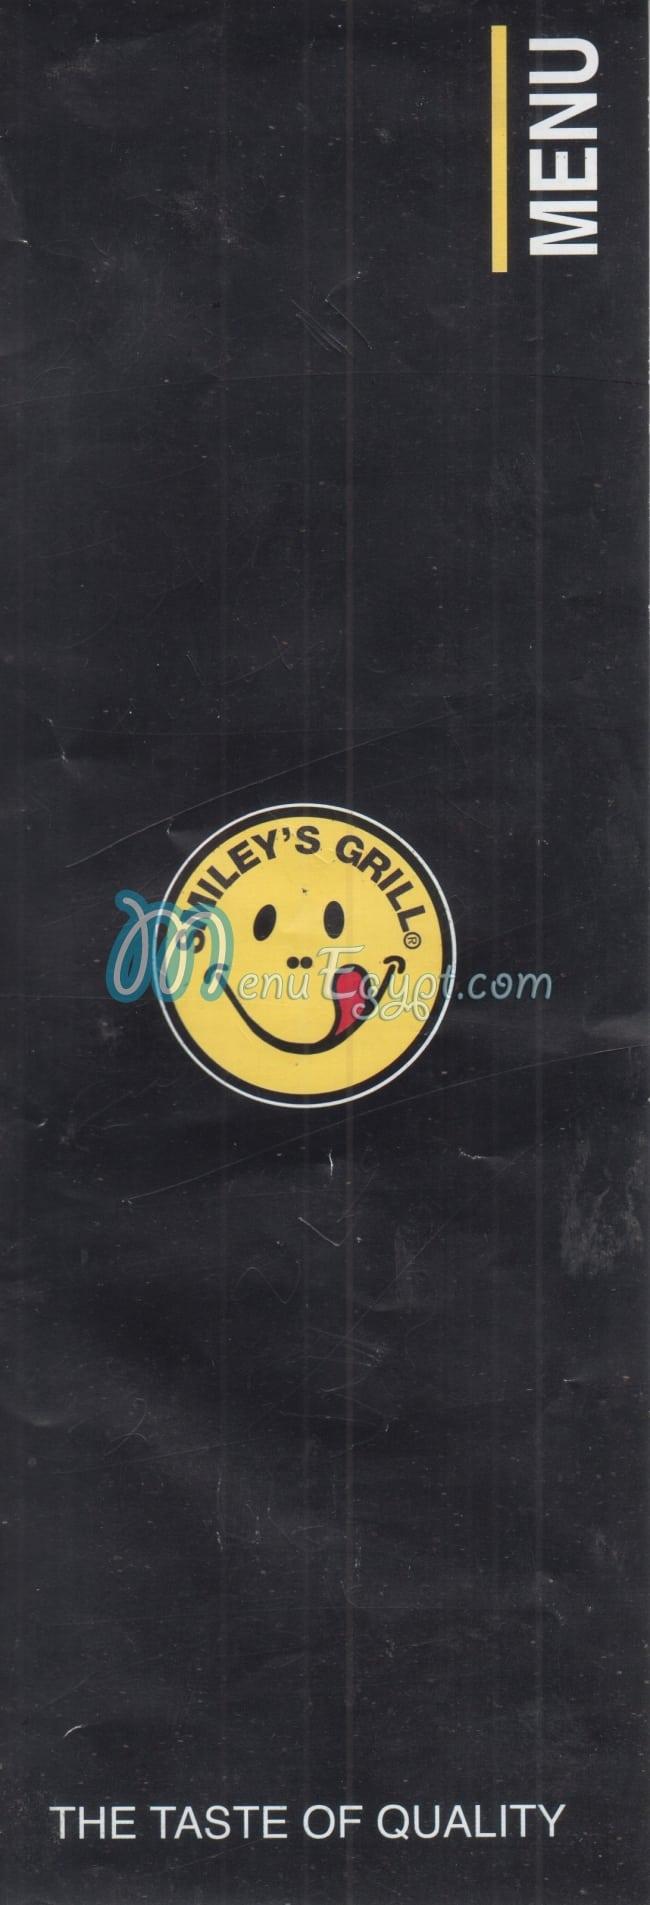 Smileys Grill menu